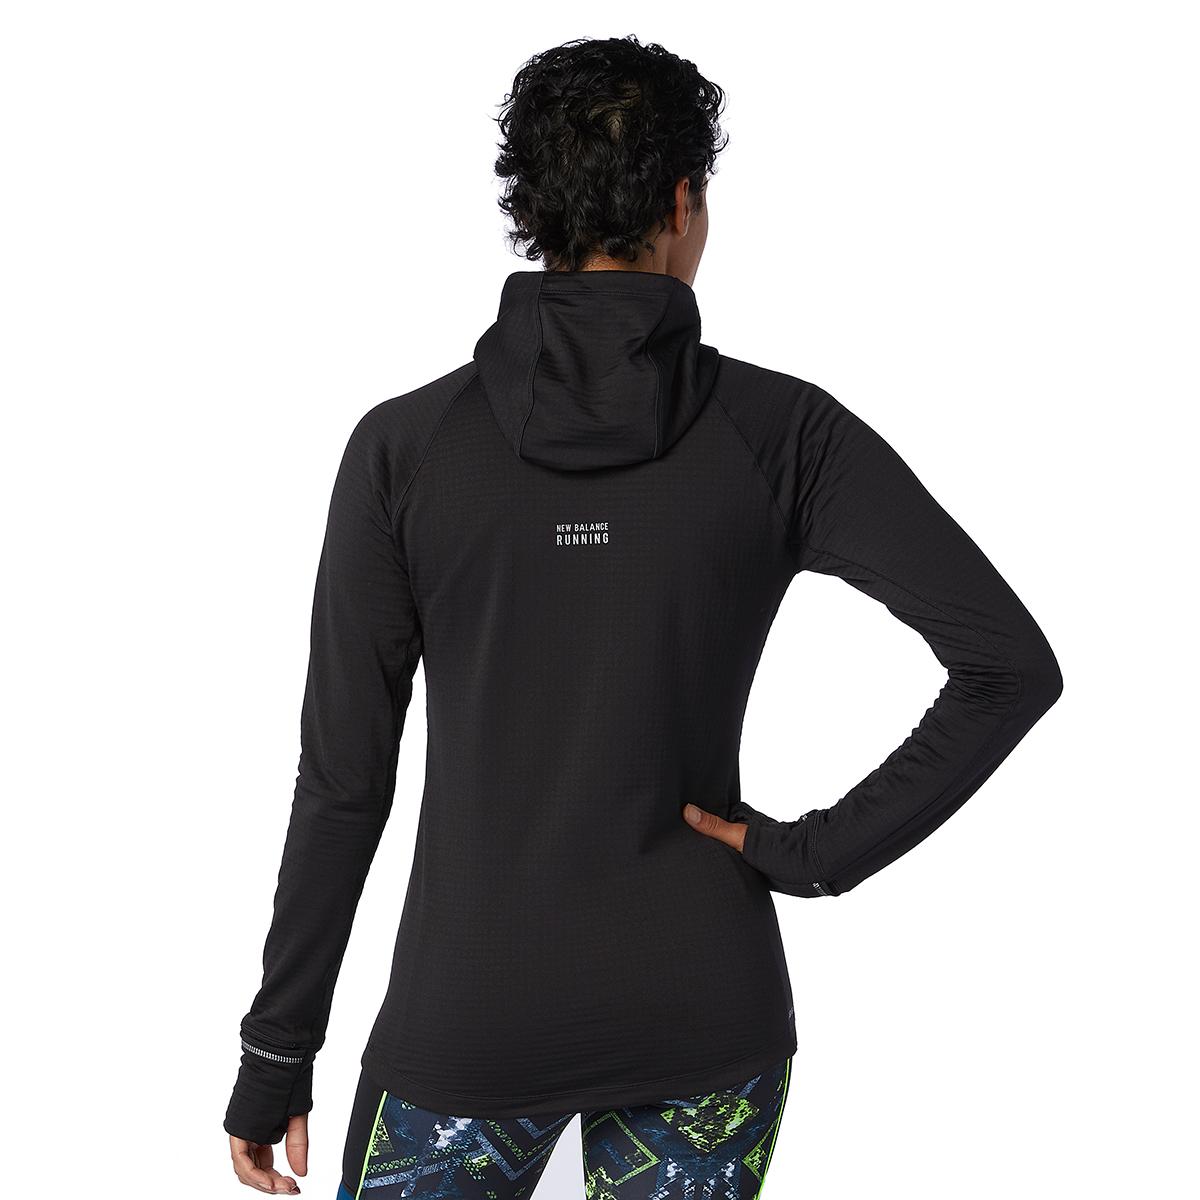 Women's New Balance Heat Grid Hoodie, , large, image 3